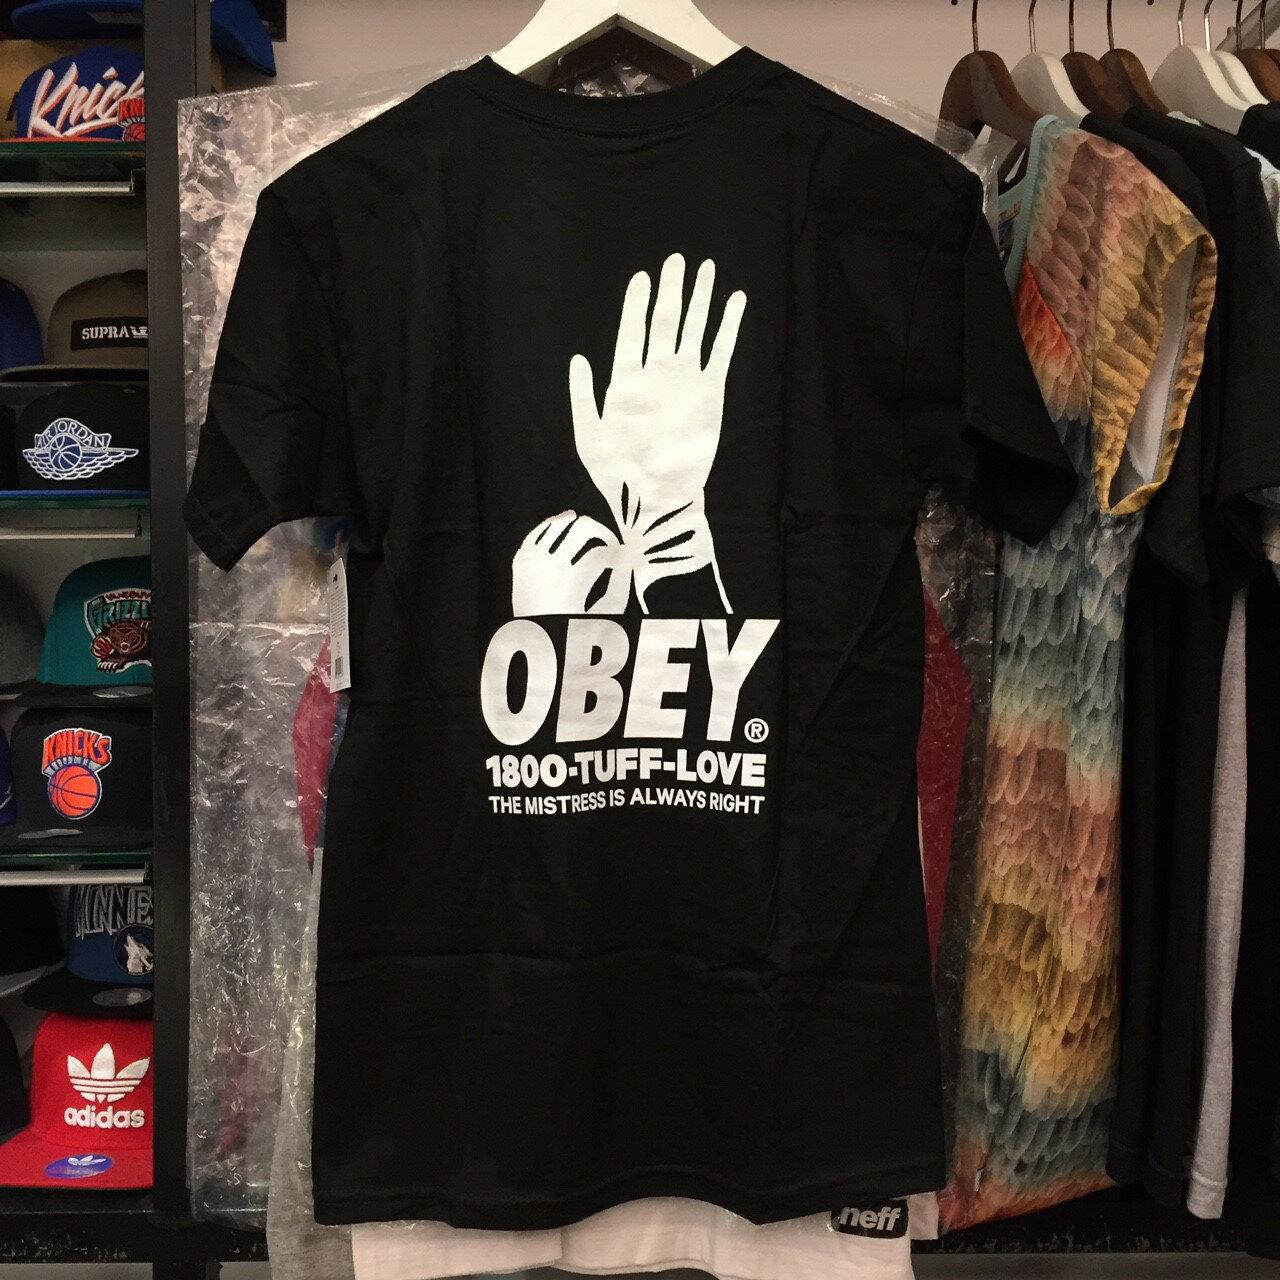 BEETLE OBEY TUFF LOVE TEE 1800 手掌 圖樣 全黑 白字 黑白 LOGO 短T TEE OB-416 163081162BLK 1